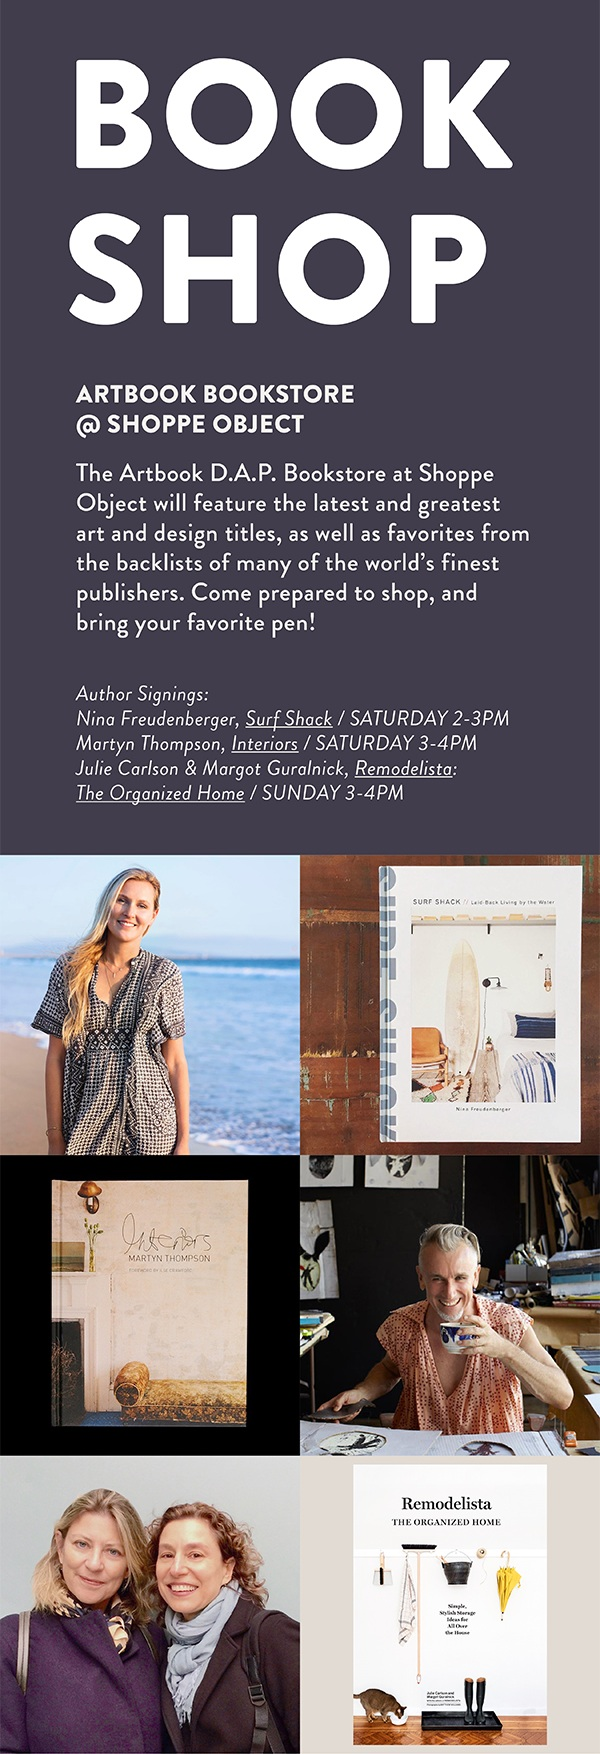 gazette_SO_10_Book+Shop_.jpg